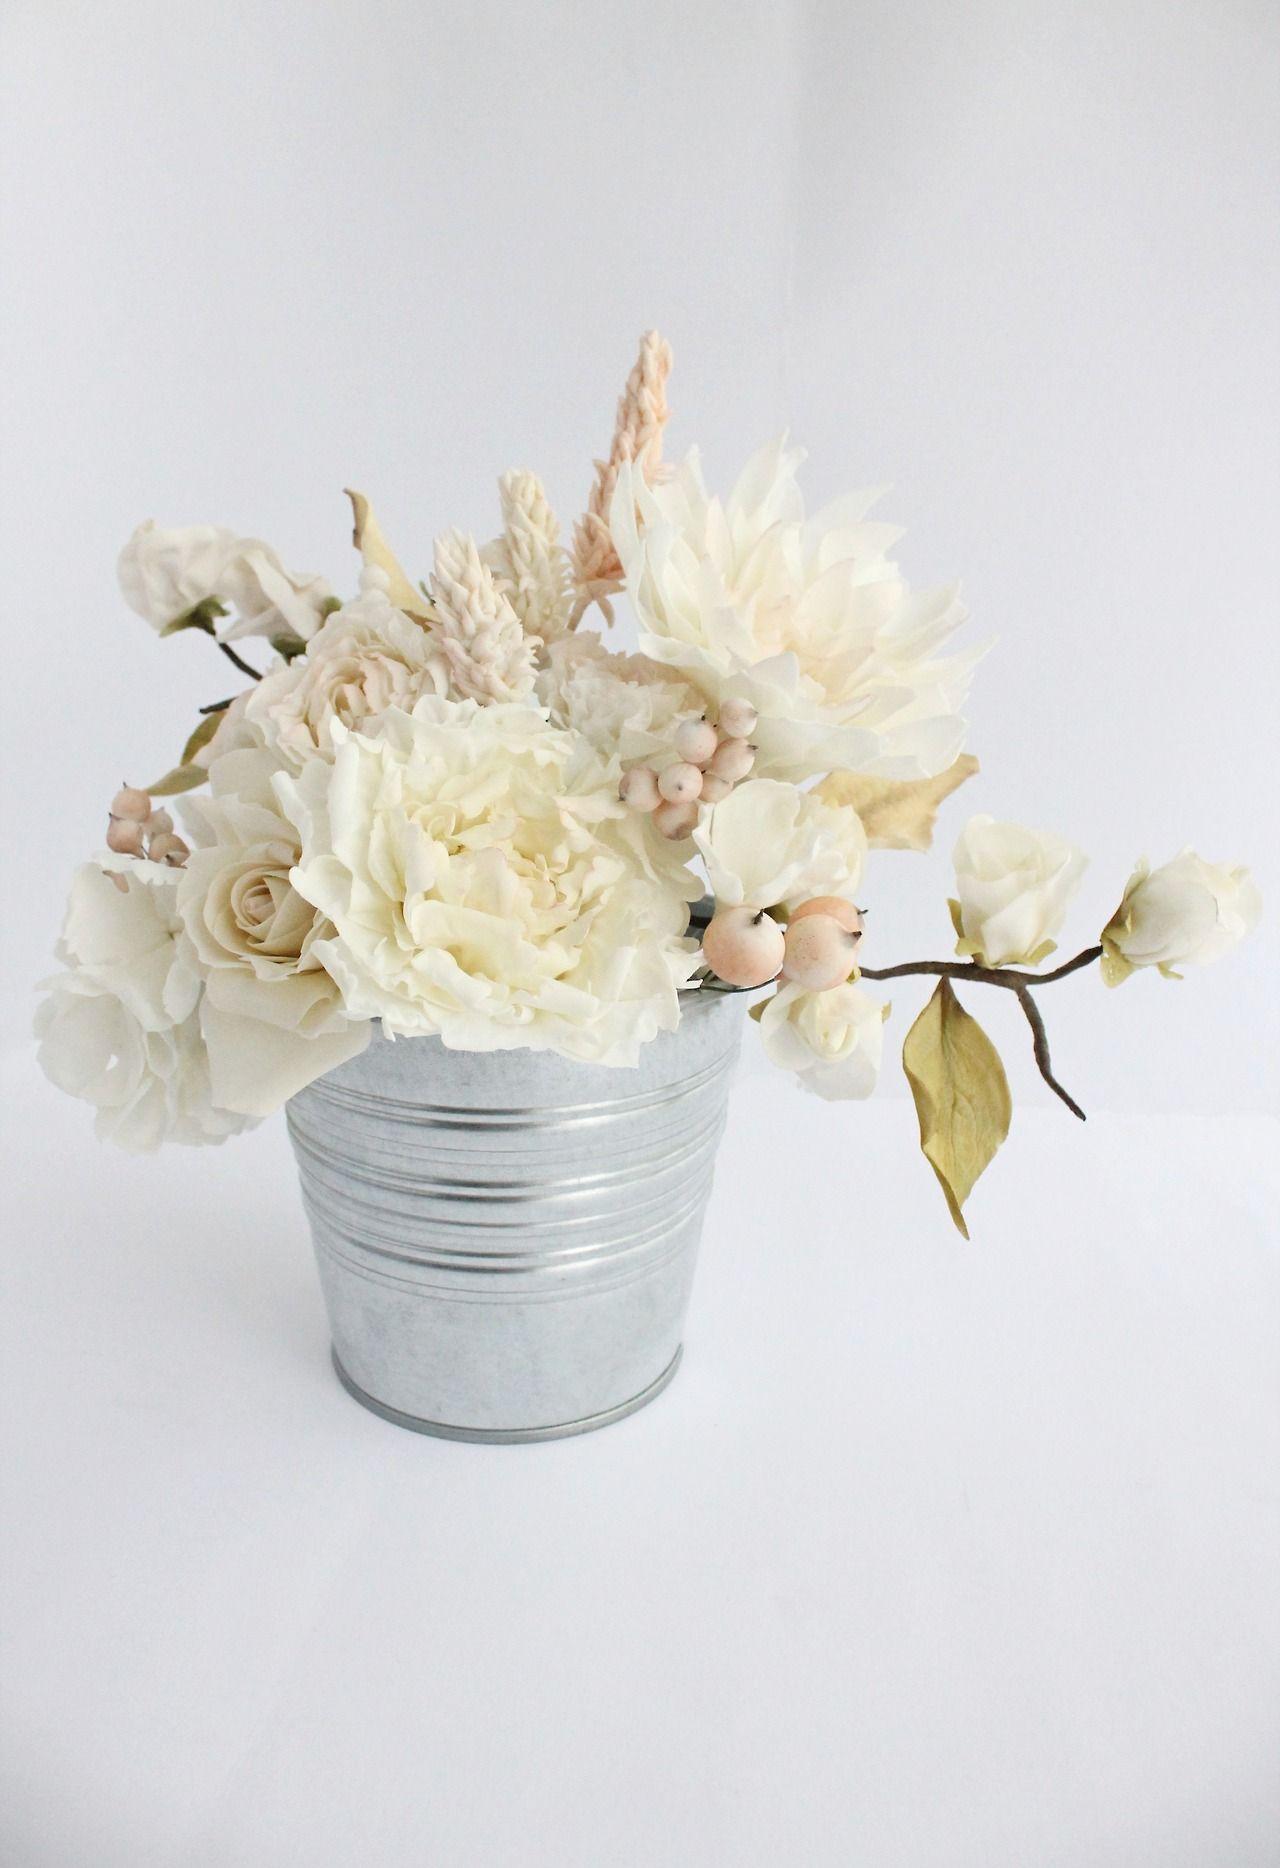 Gumpaste Flowers Spray Rose Berries Dahlia Rose Peony Celosia